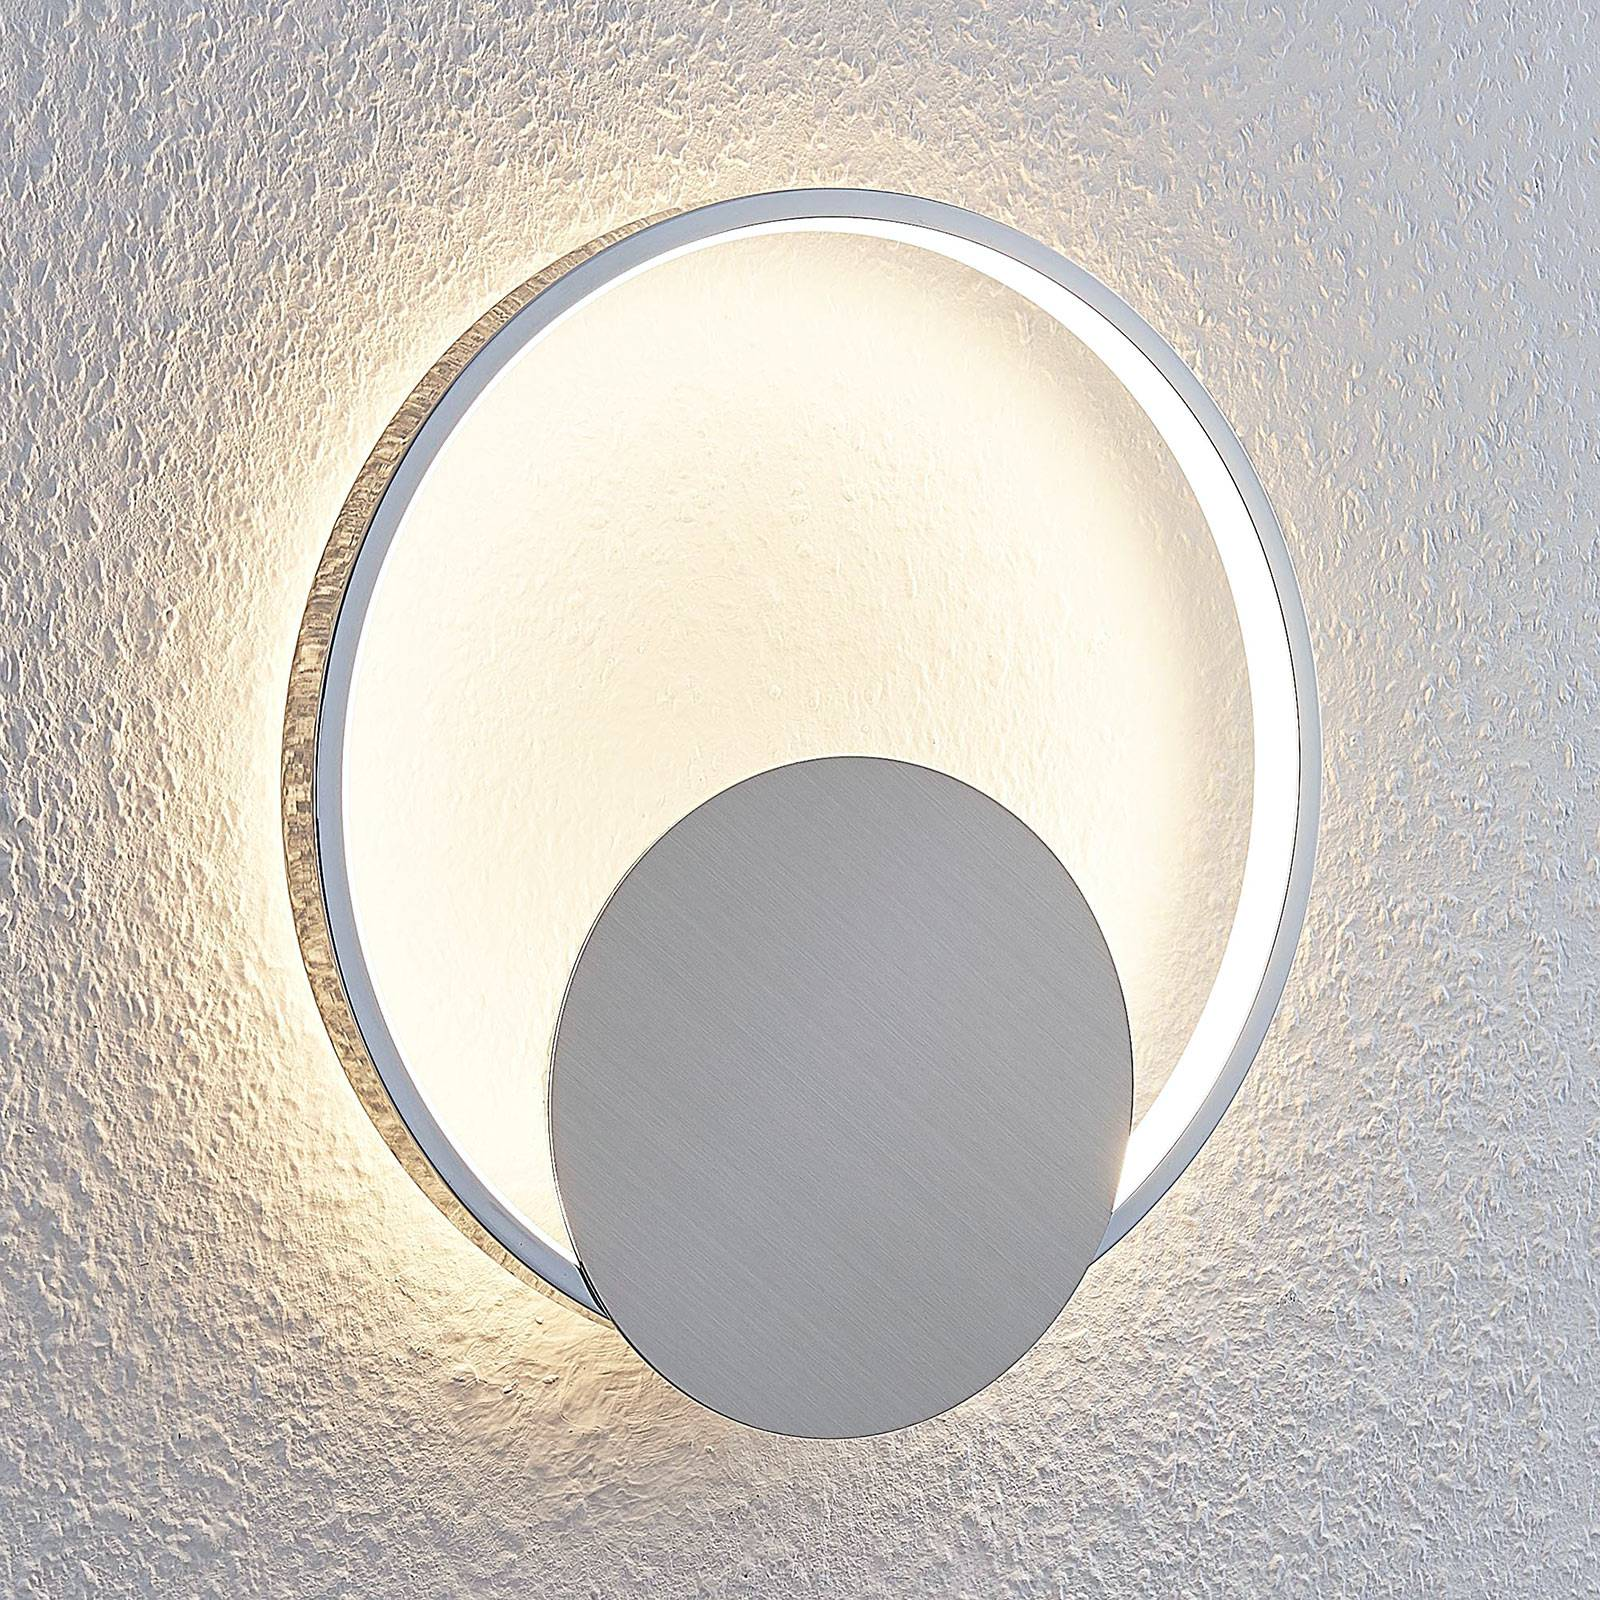 LED-seinävalaisin Anays, pyöreä, 32 cm